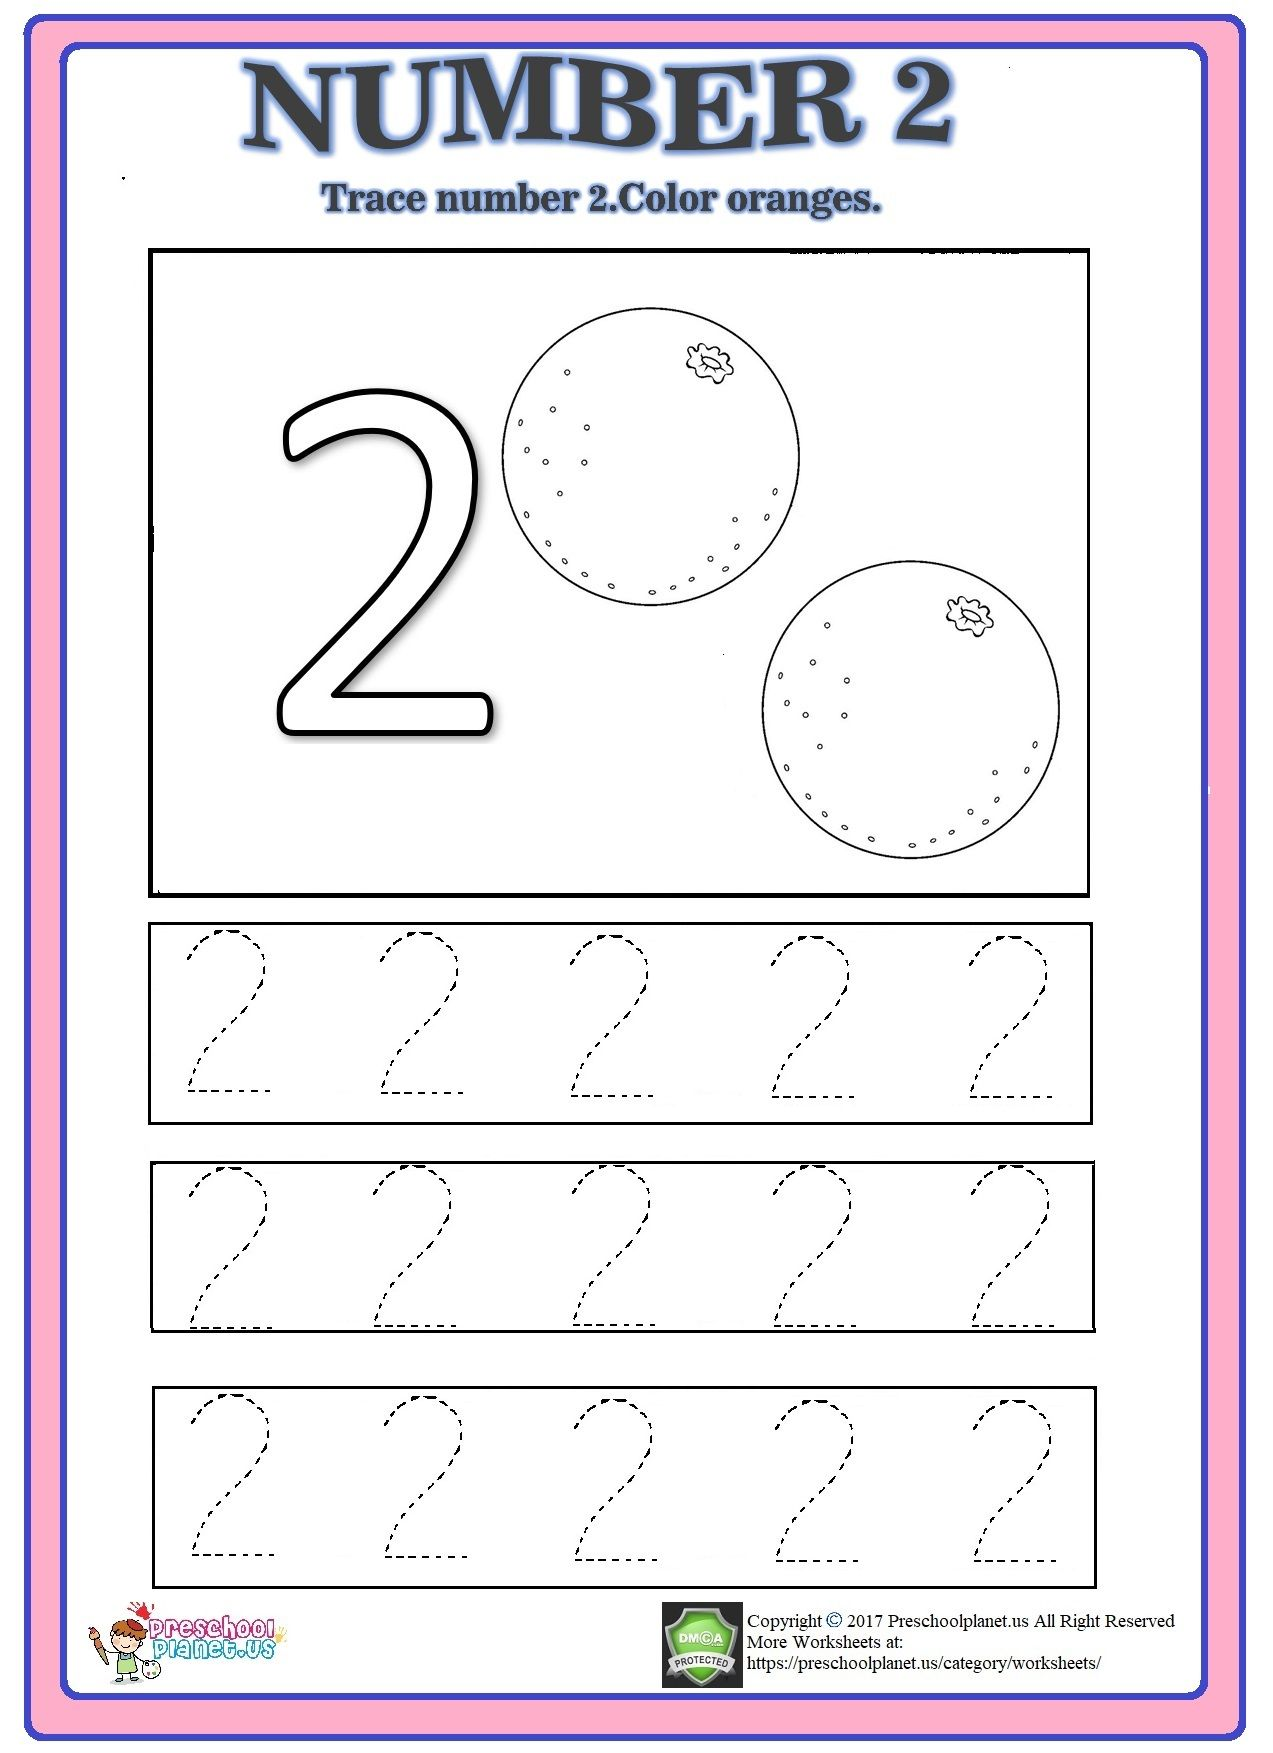 Number 2 Trace Worksheet Rakam Tanma Pinterest Numbers